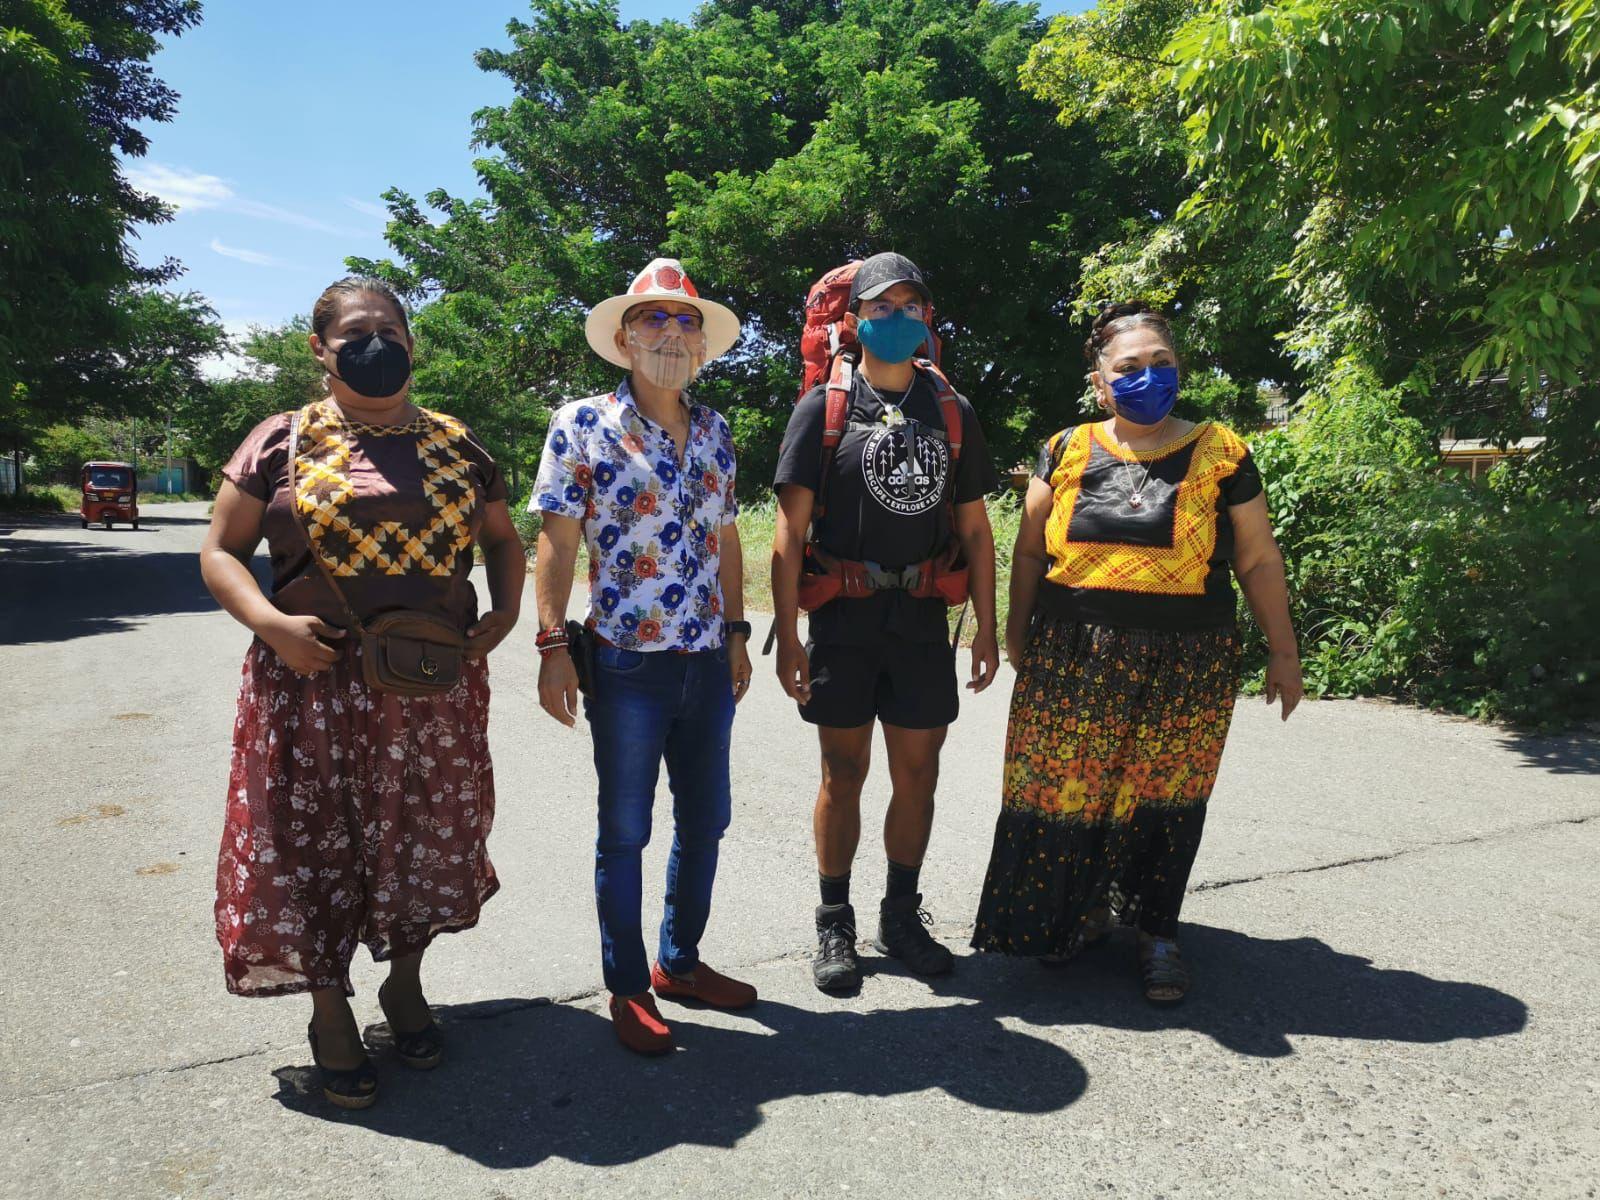 Llega a Oaxaca exbailarín que recorre las 7 maravillas del mundo para recaudar fondos para VIH